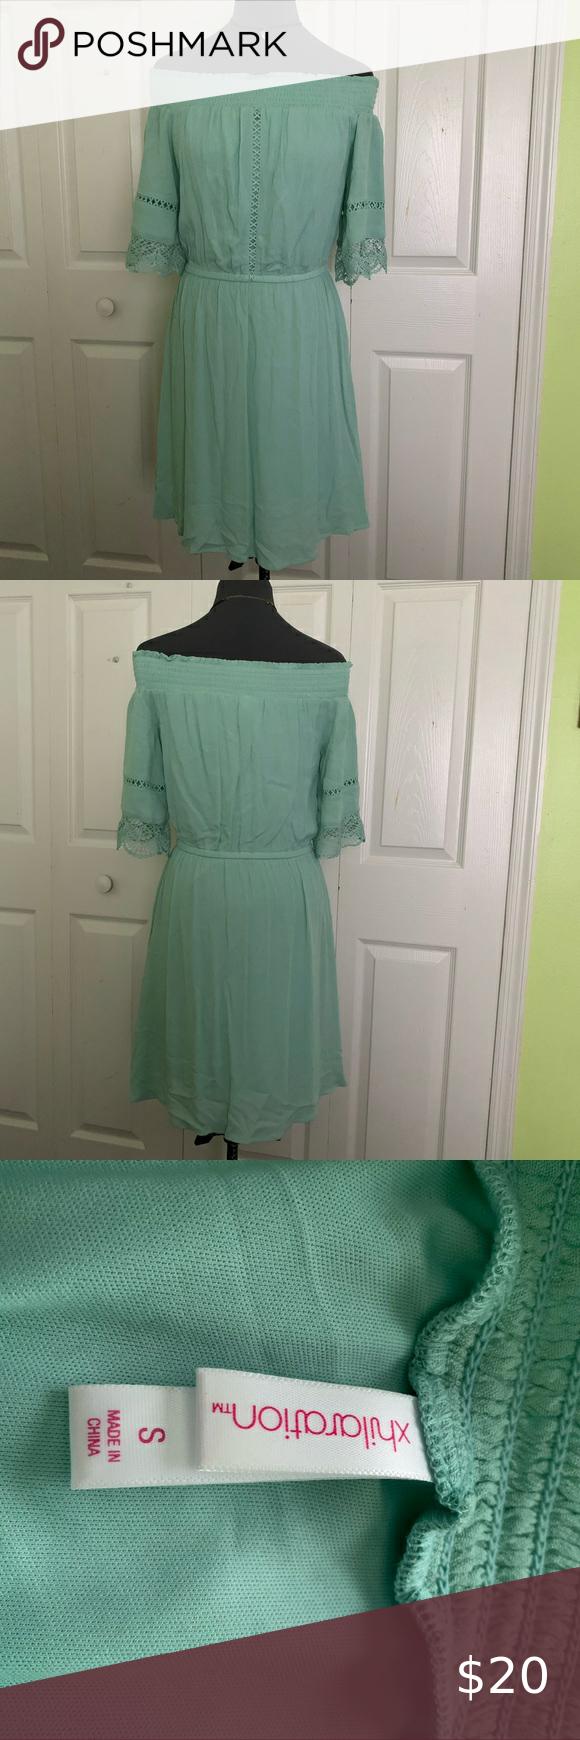 2 20 Target Xhilaration Mint Green Shoulder Dress Dresses Clothes Design Shoulder Dress [ 1740 x 580 Pixel ]